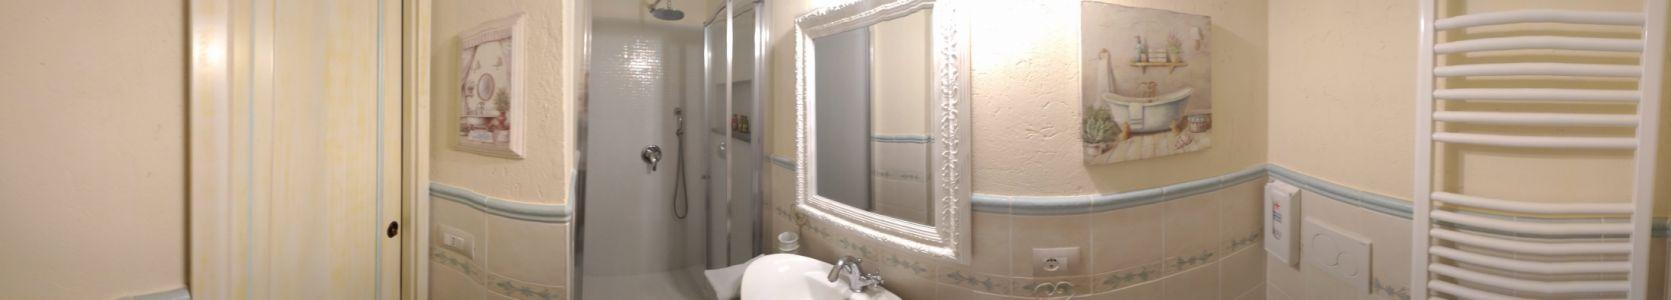 Ulivo Room Le Colline di Bana B&B